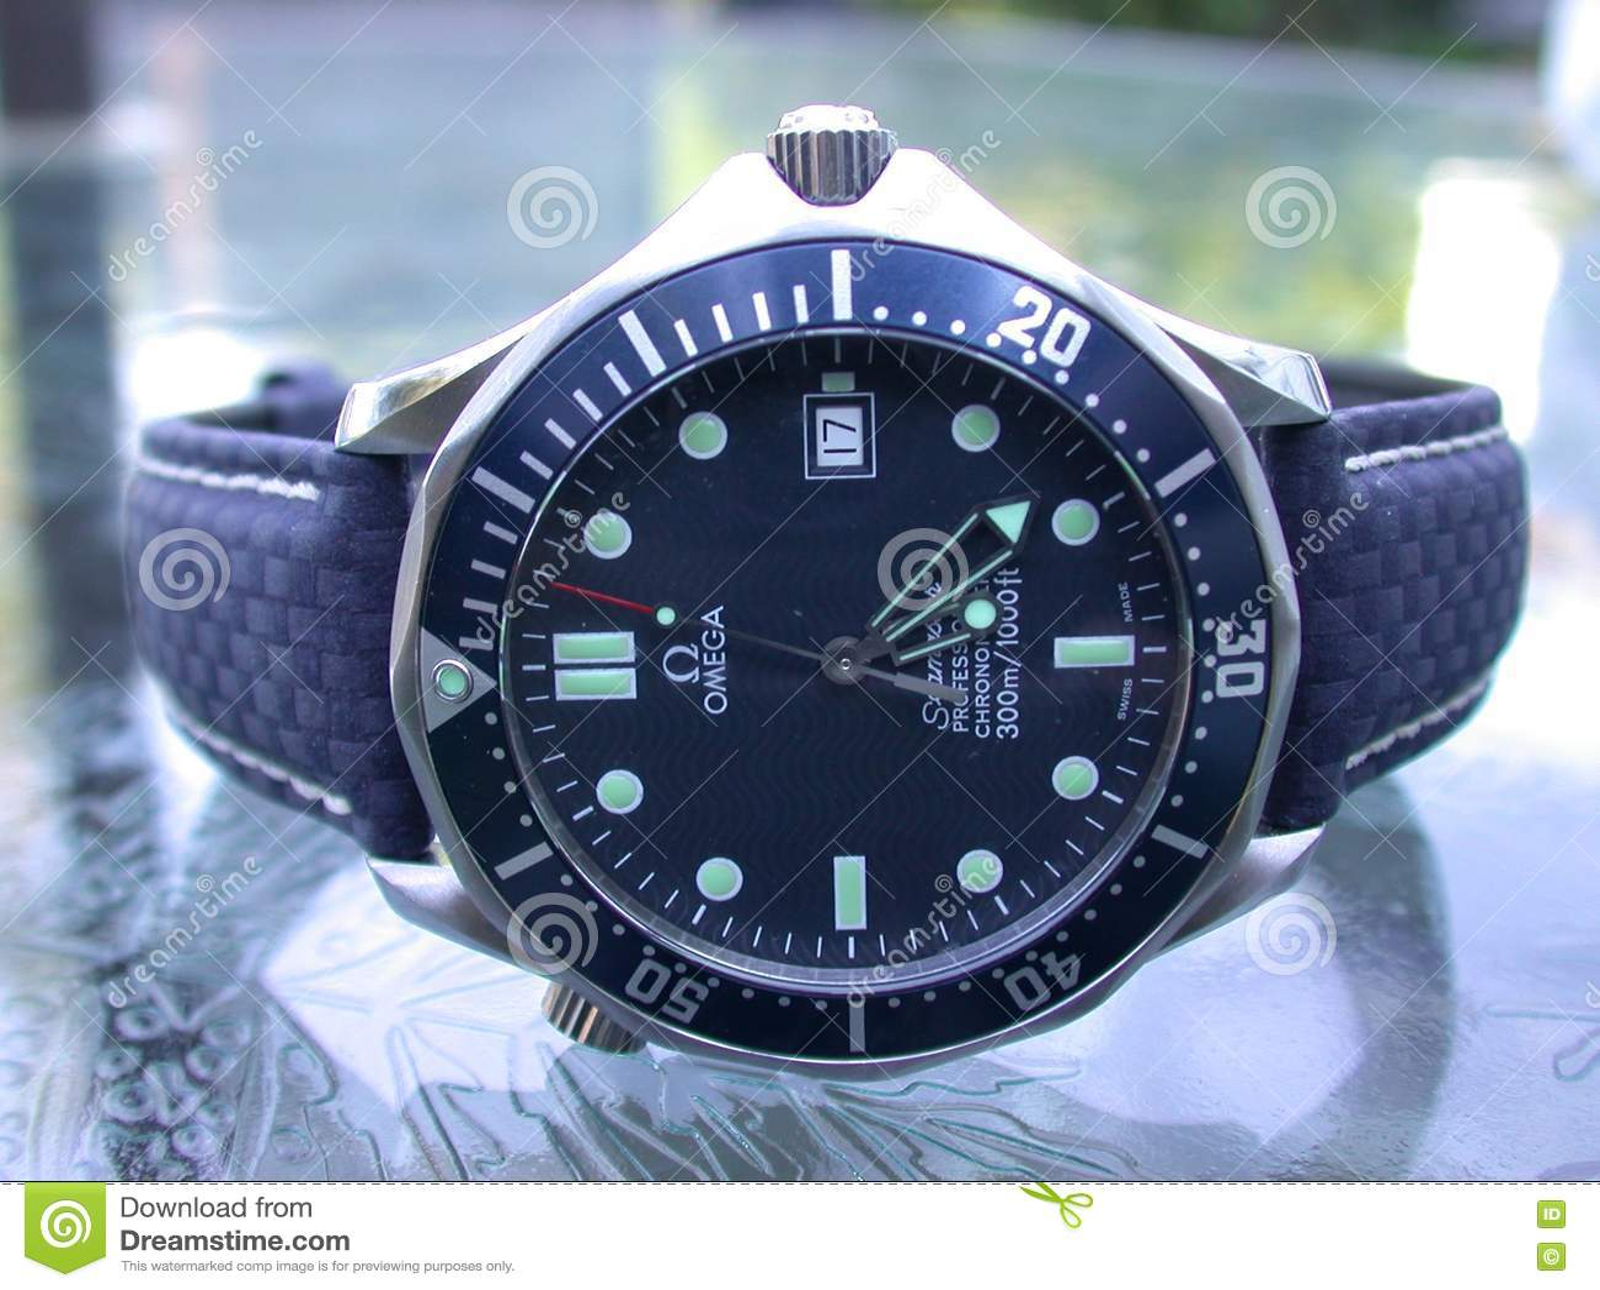 Papel Pintado Del Reloj De Omega Seamaster 007 Imagen De